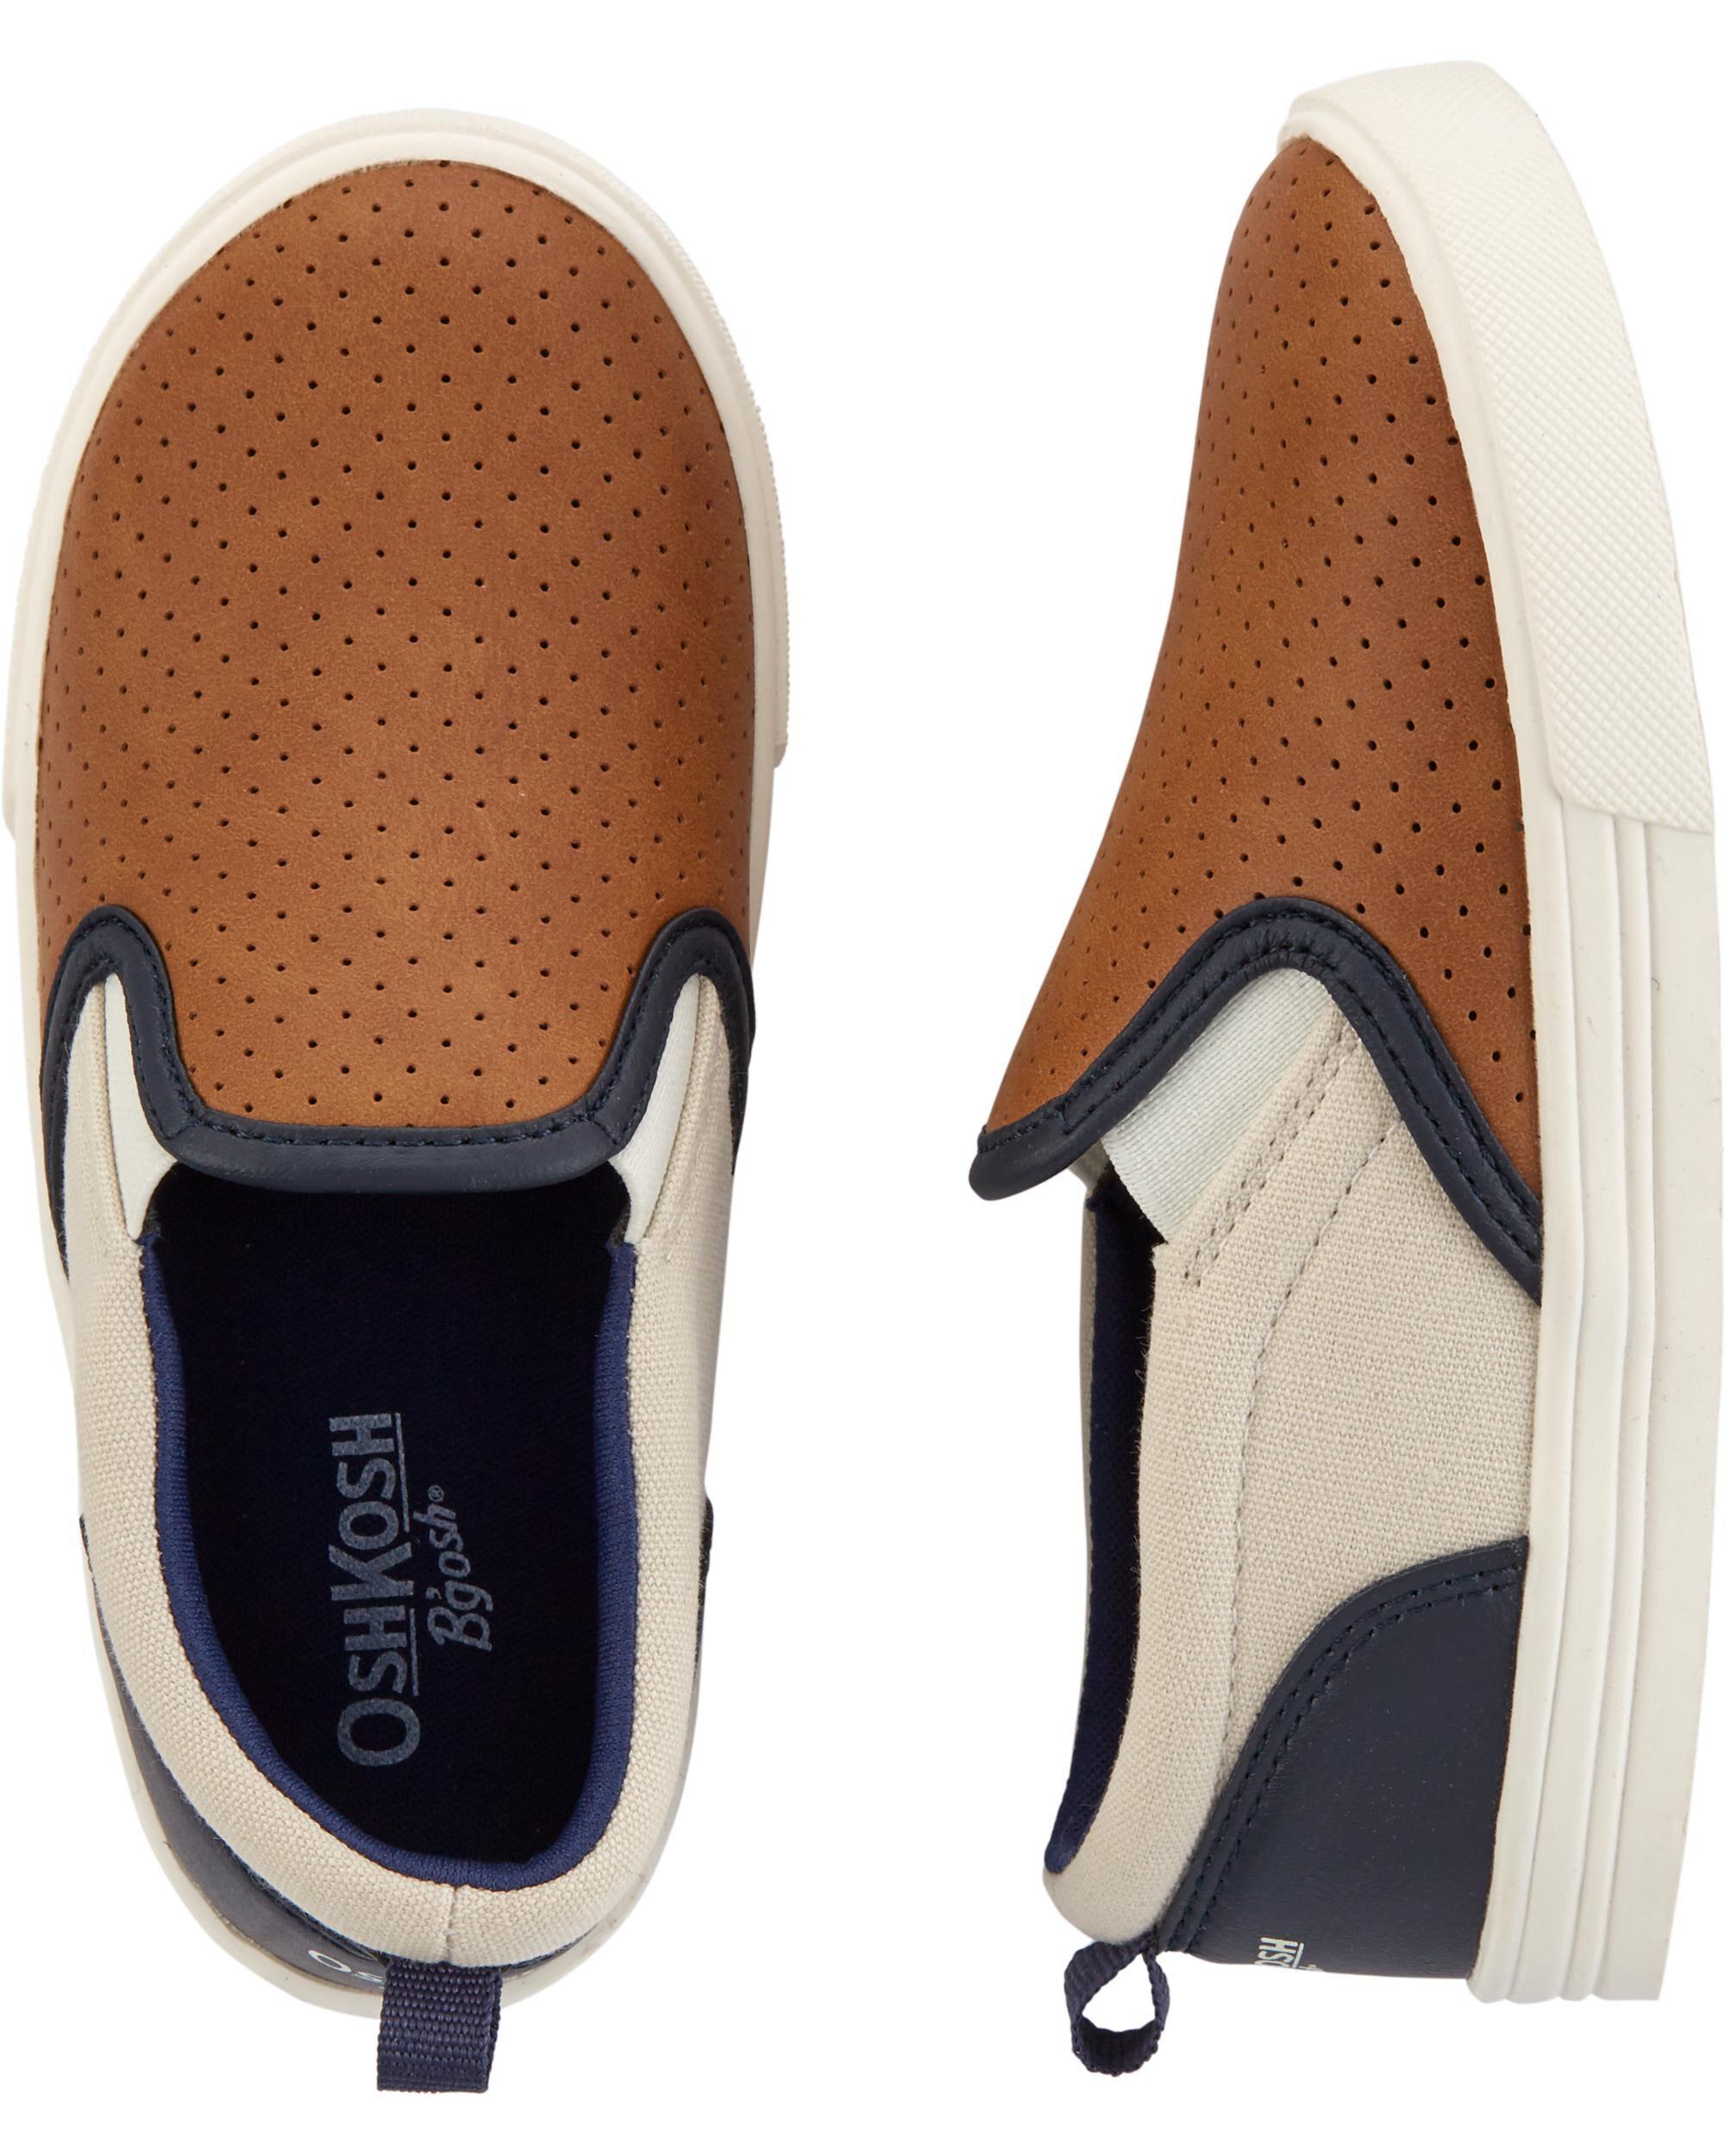 Oshkoshbgosh Colorblock Slip-On Shoes